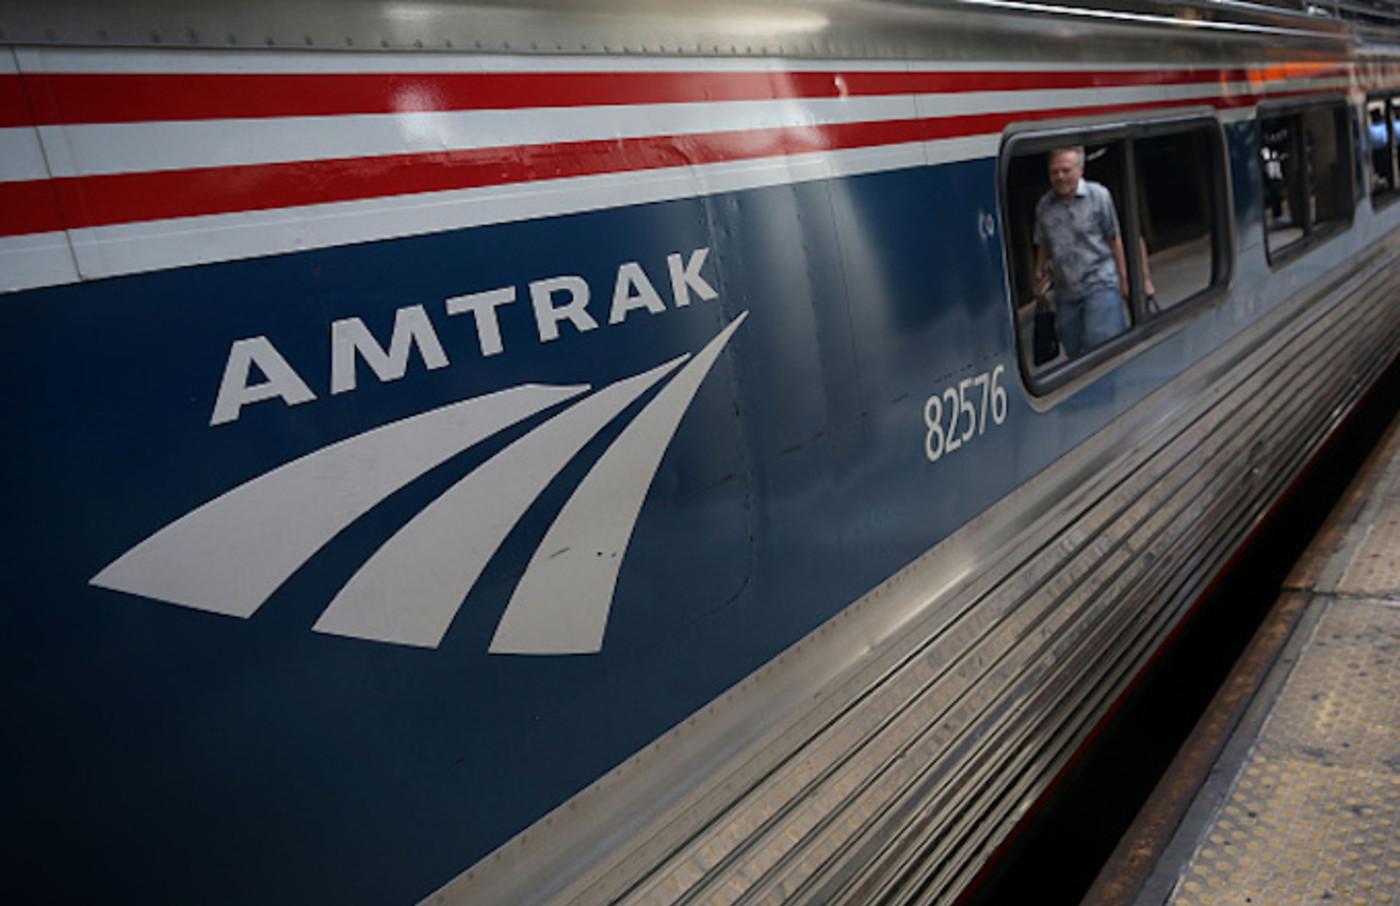 A passenger passes by an Amtrak train